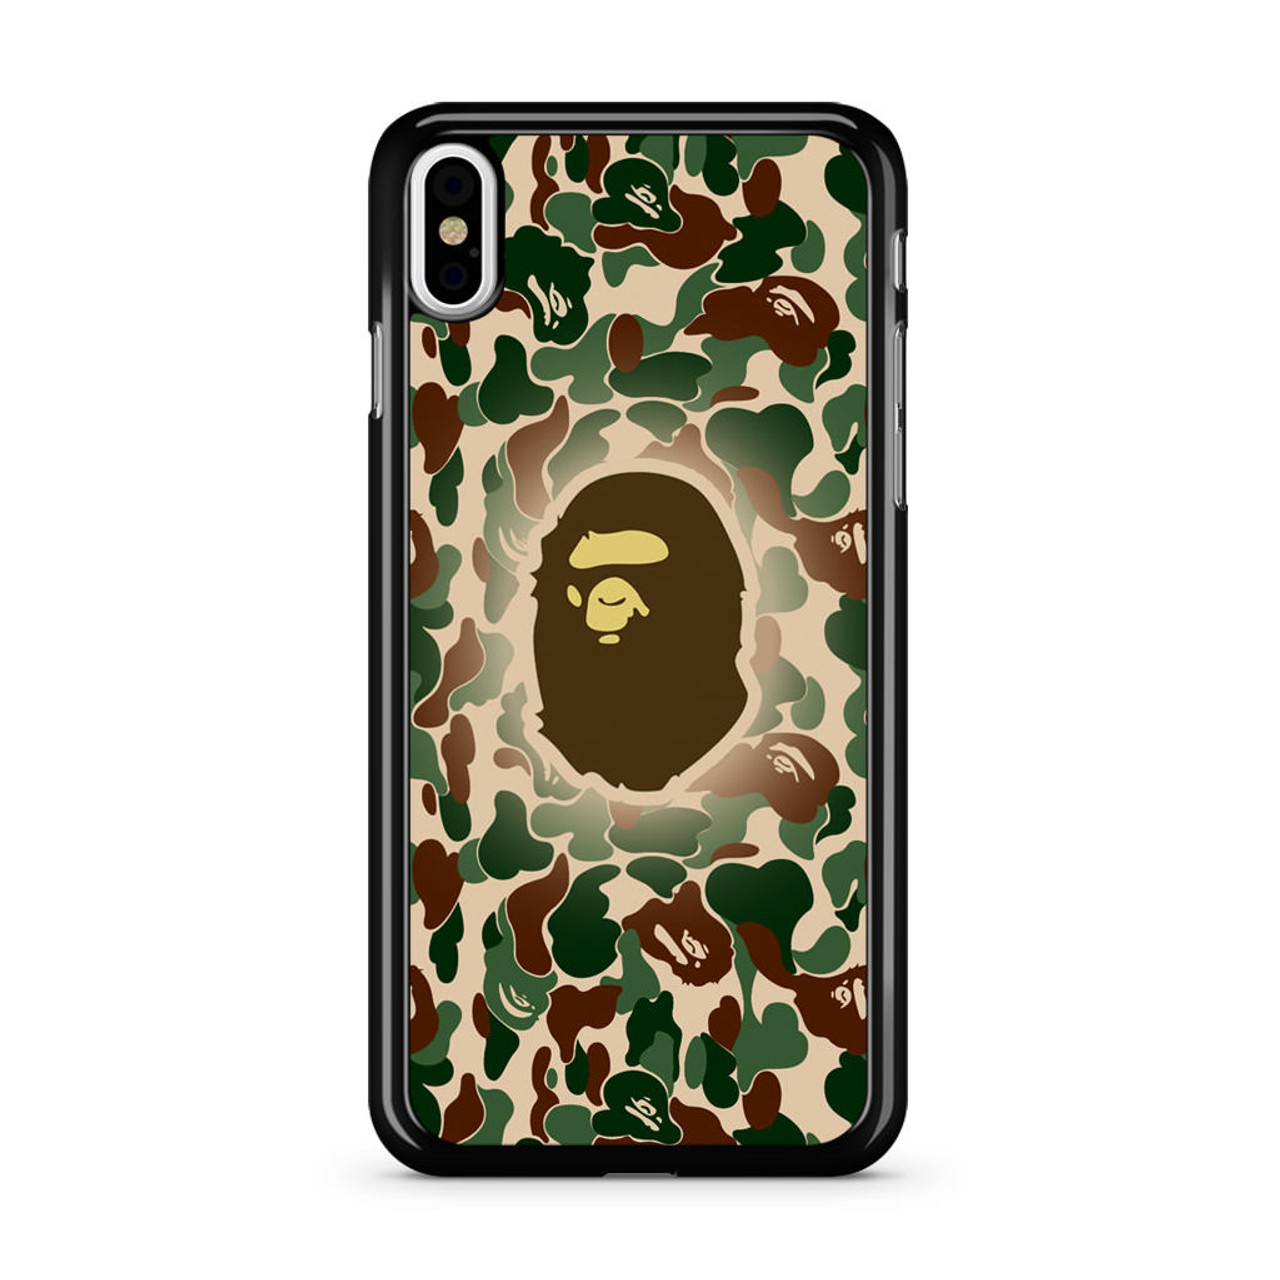 huge selection of 6be0b 16ff6 Bathing Ape Bape Camo iPhone Xs Case